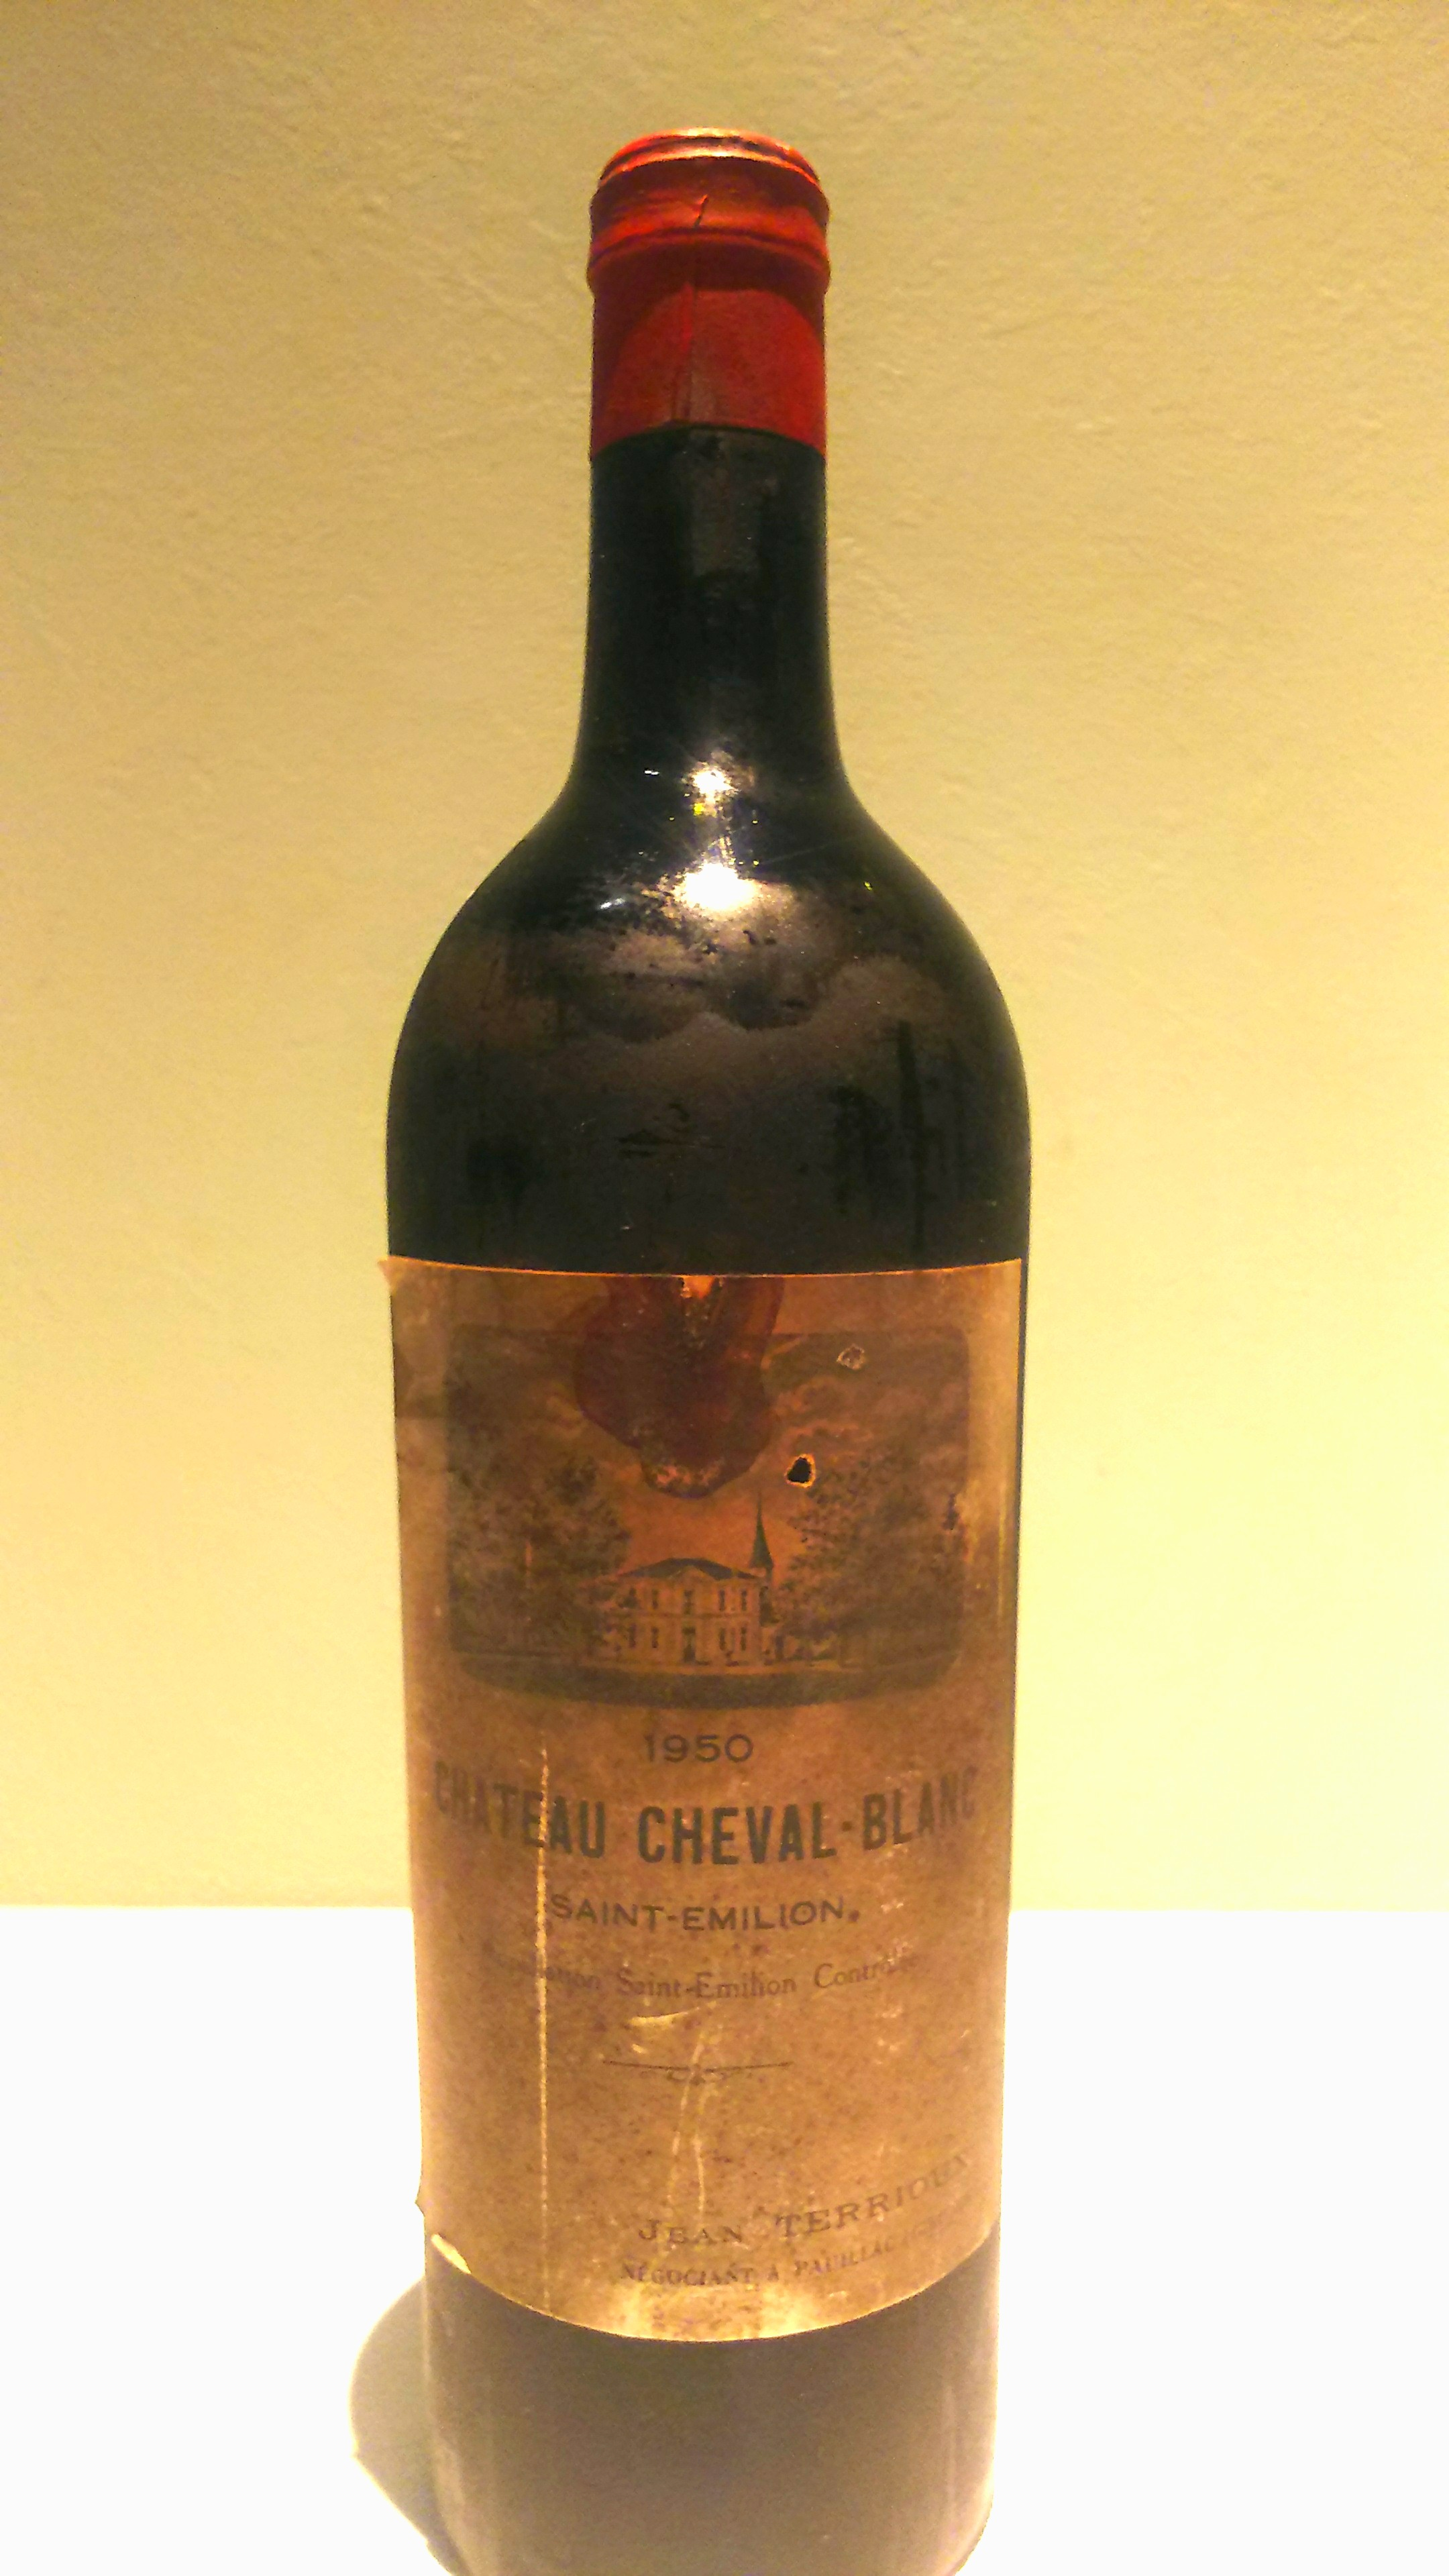 http://encens.silk.to/winelist/uplaod/1950Cheval%20Blanc.jpg